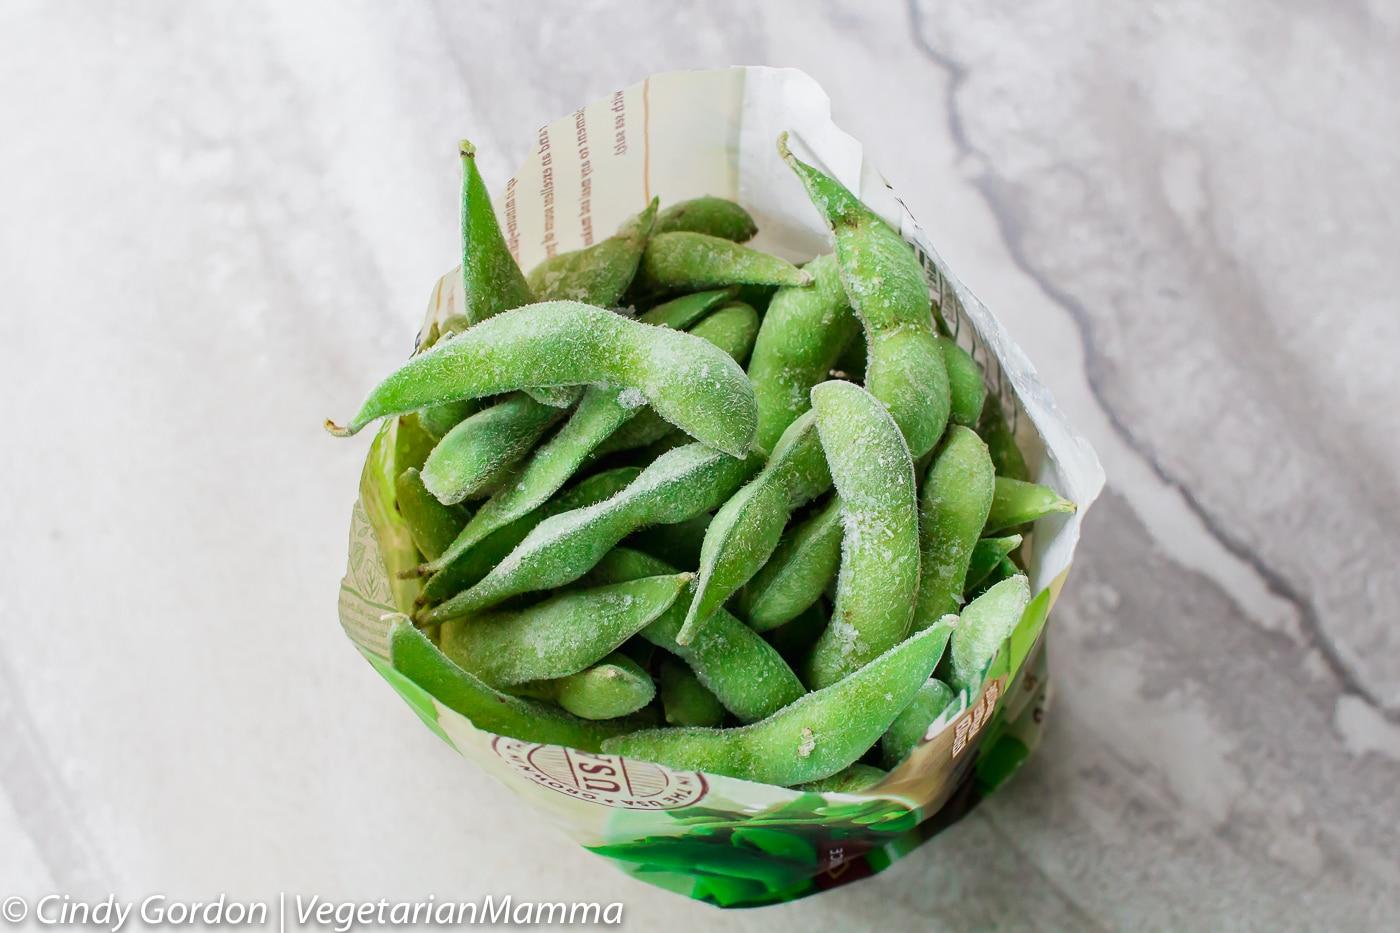 bag of frozen edamame